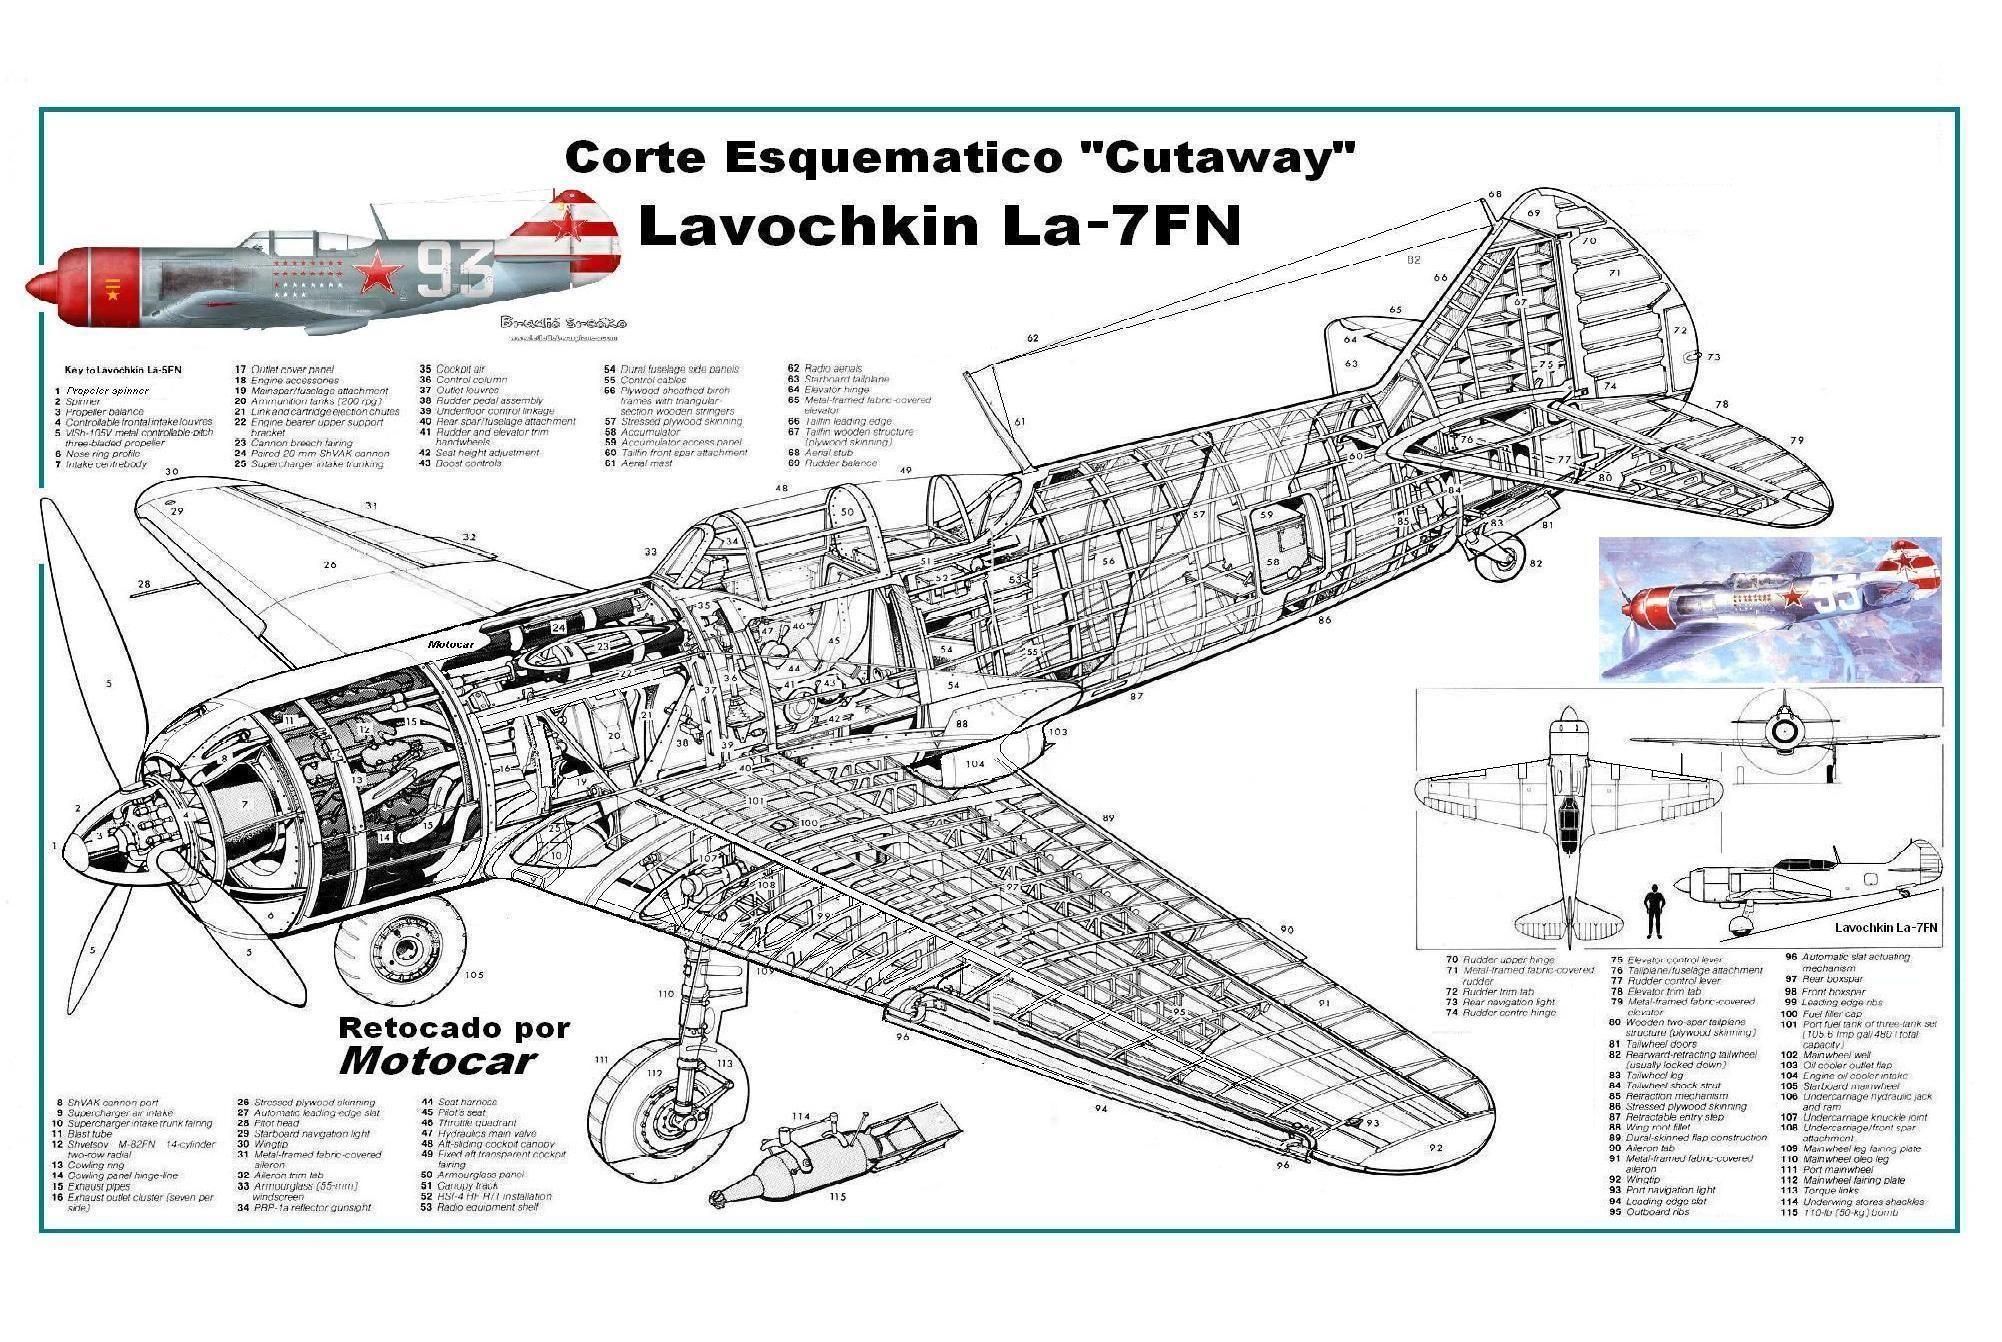 Pin On Aircarft Cutaways